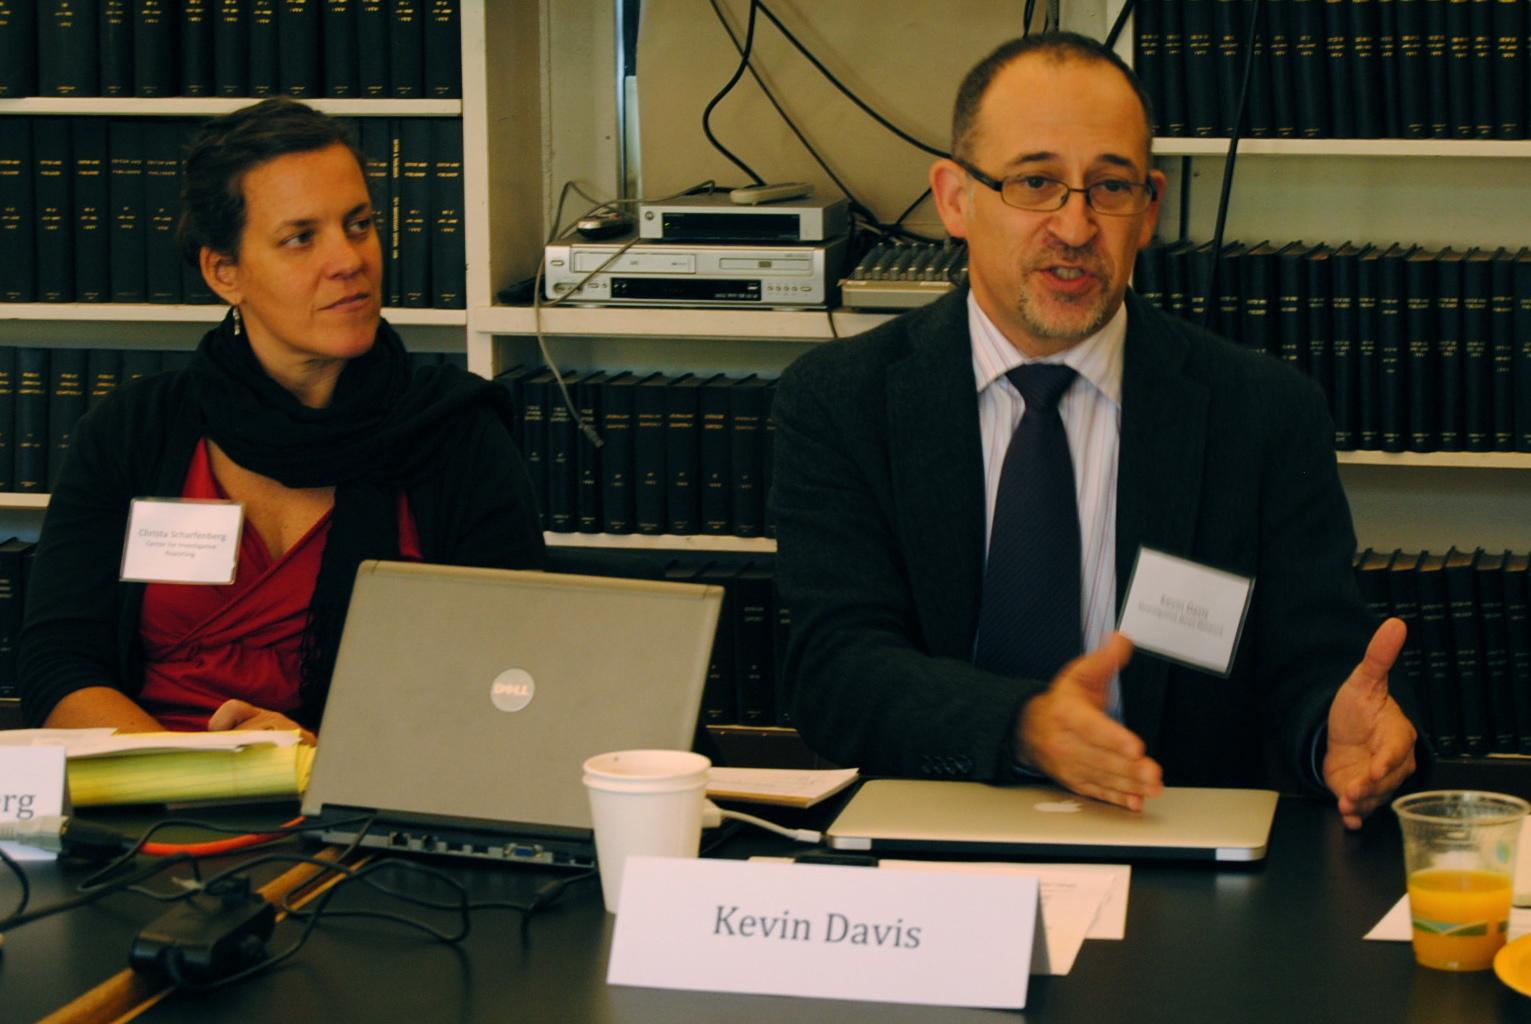 http://www.pbs.org/mediashift/2011/12/01/DSC_0020